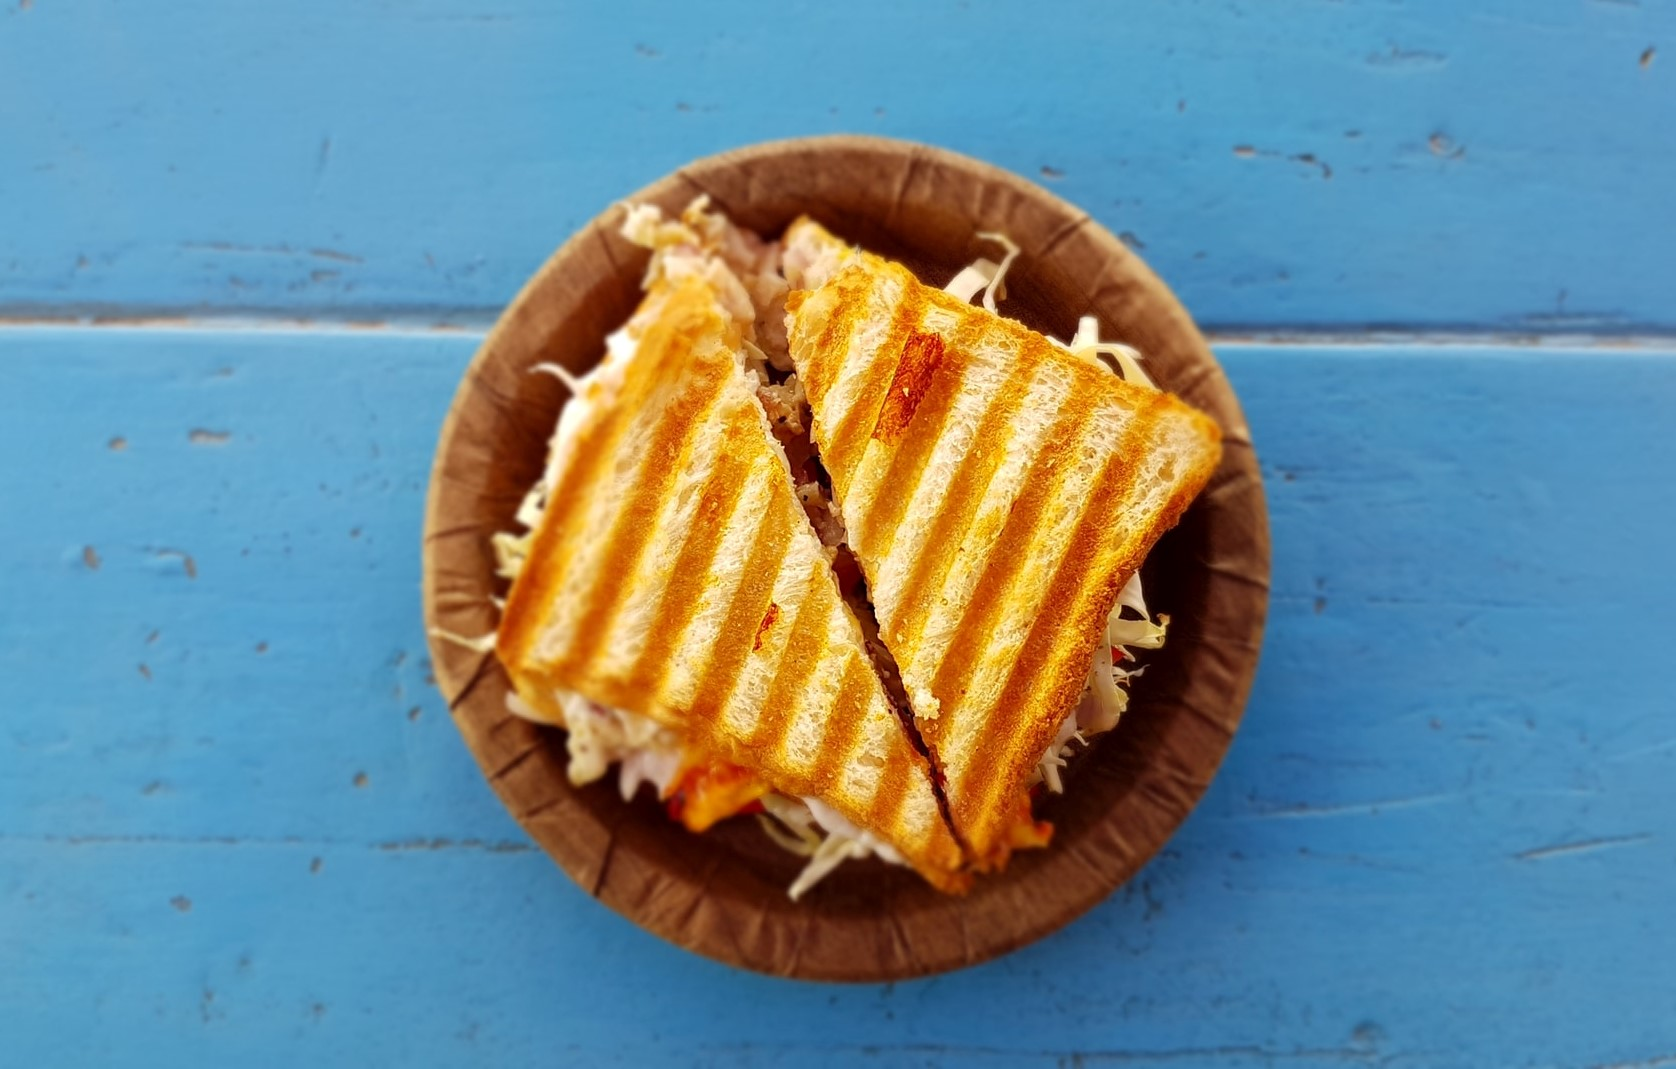 sandwich on a blue table